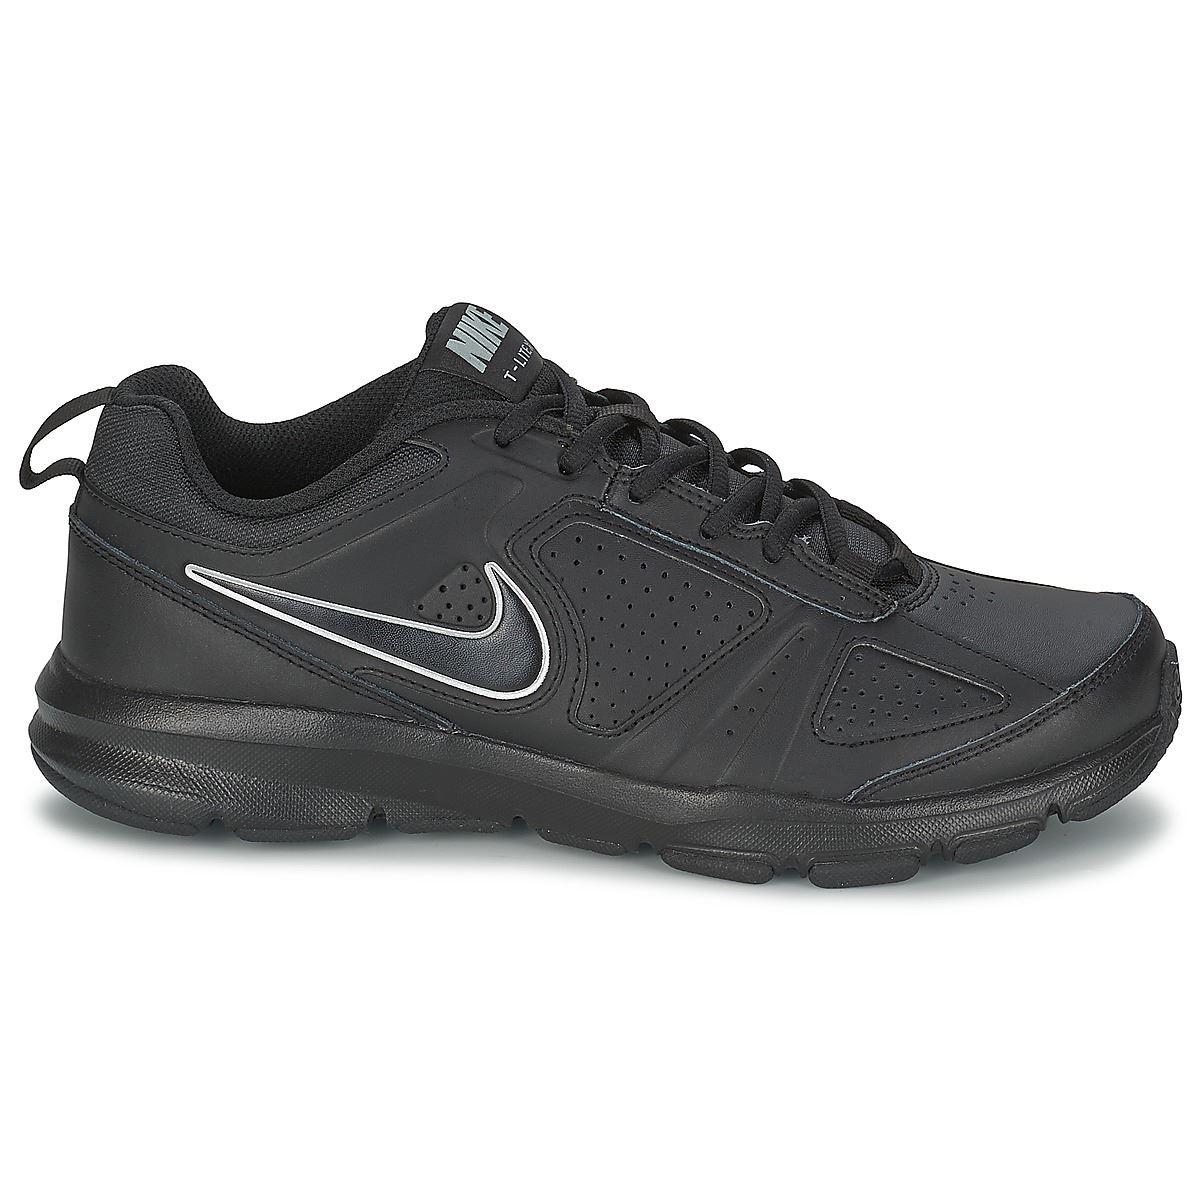 Nike trainers t lite xi women s sneakers sports runing shoes black - Nike T Lite Xi Black Mens Trainers 616544 007